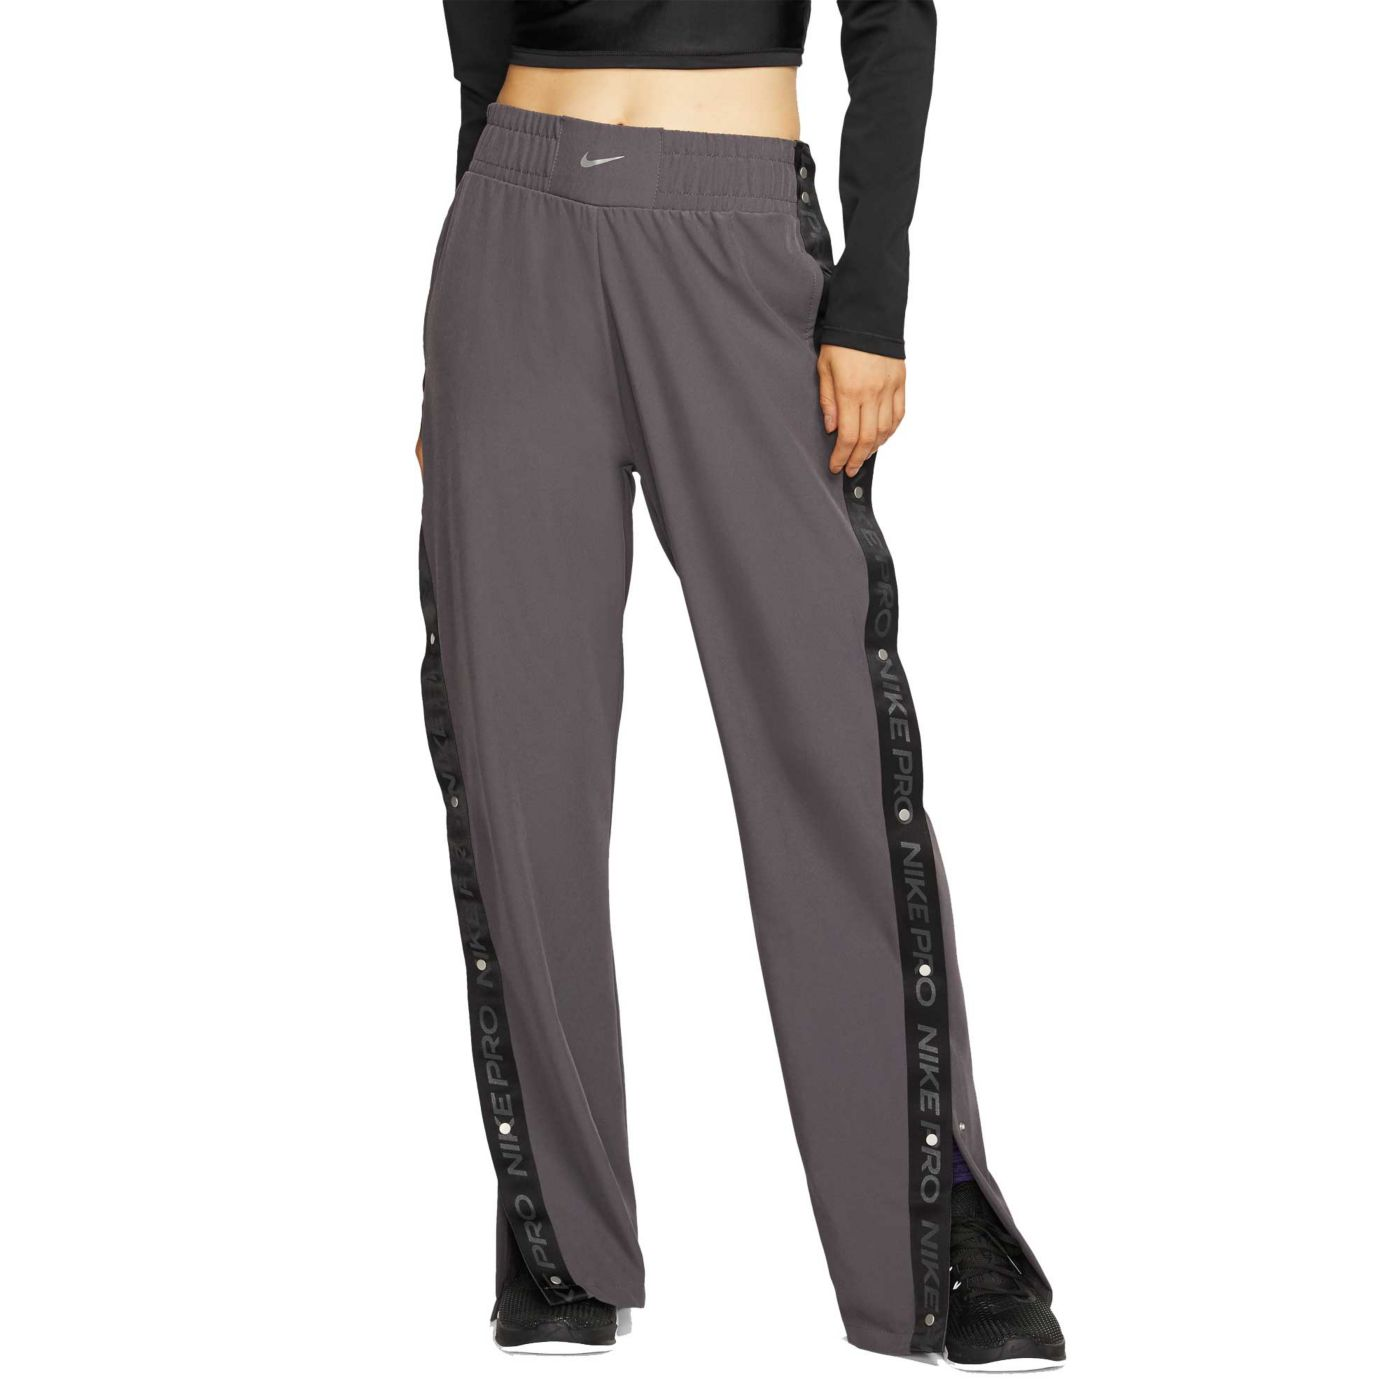 Nike Women's Pro Tear Away Pant